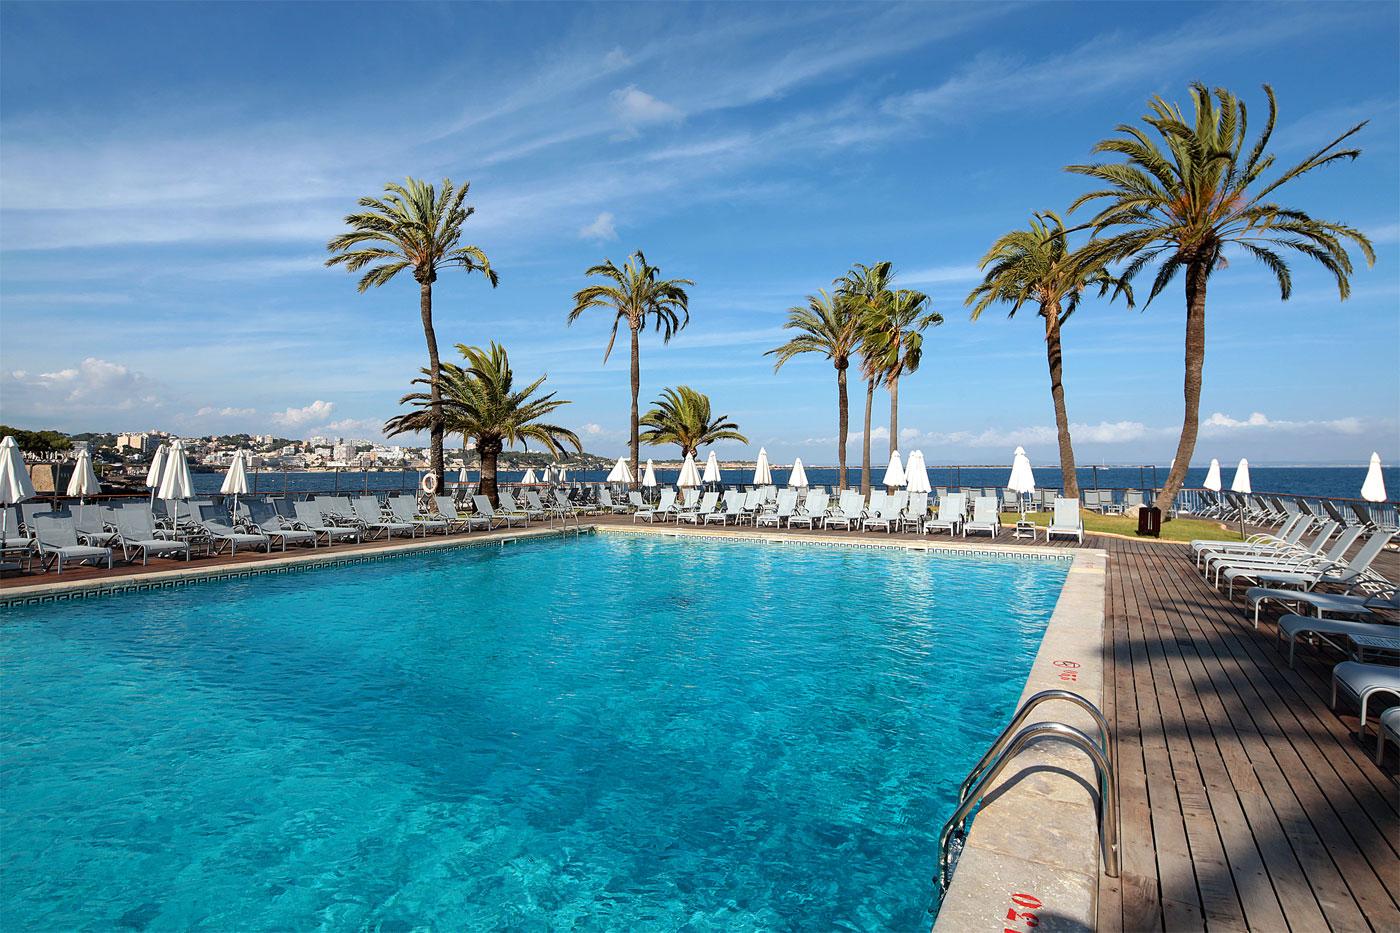 fotos del hotel riu palace bonanza playa illetas mallorca. Black Bedroom Furniture Sets. Home Design Ideas